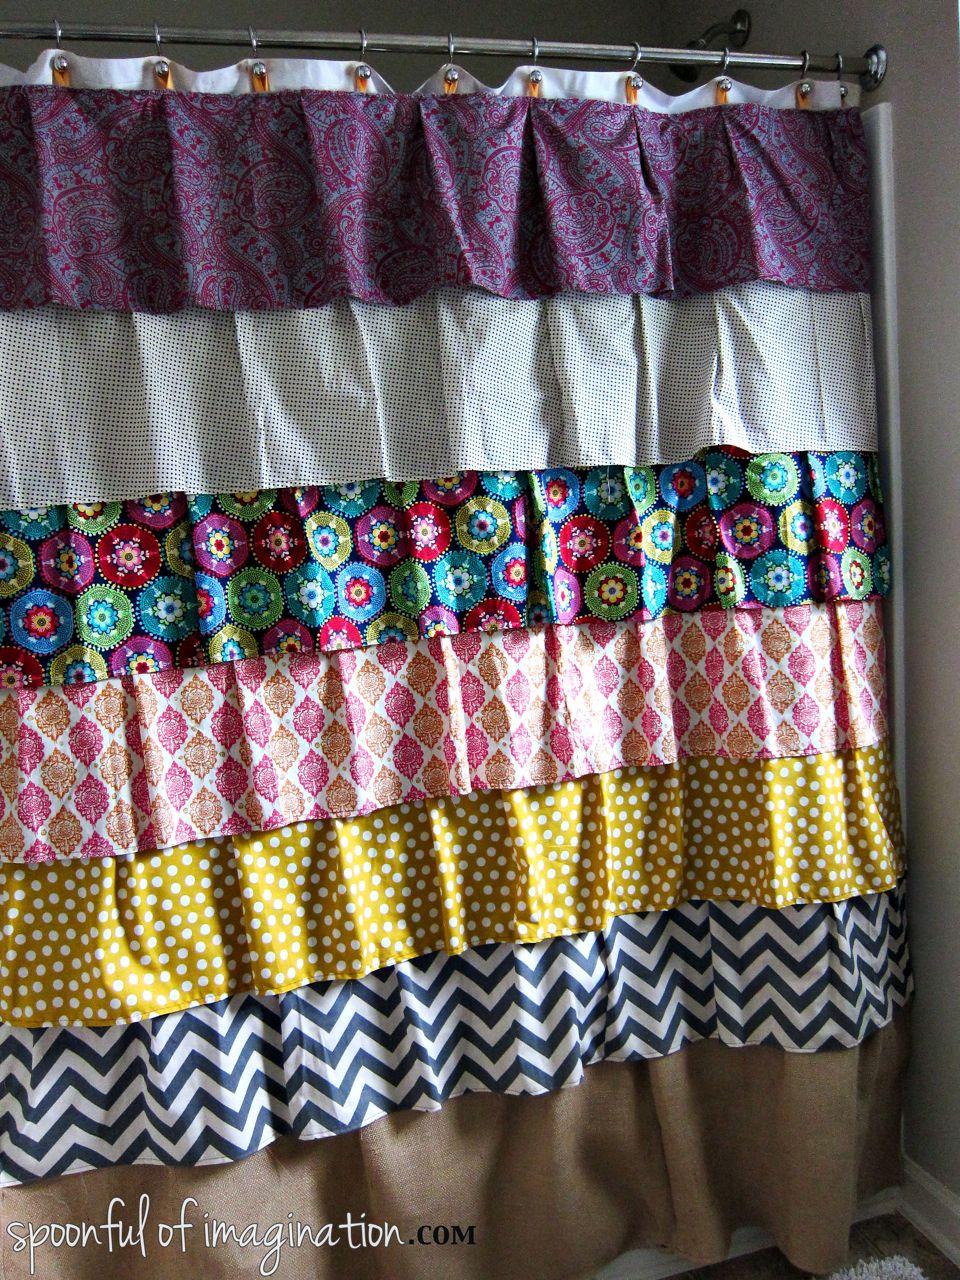 Diy ruffled shower curtain - Homemade Shower Curtain